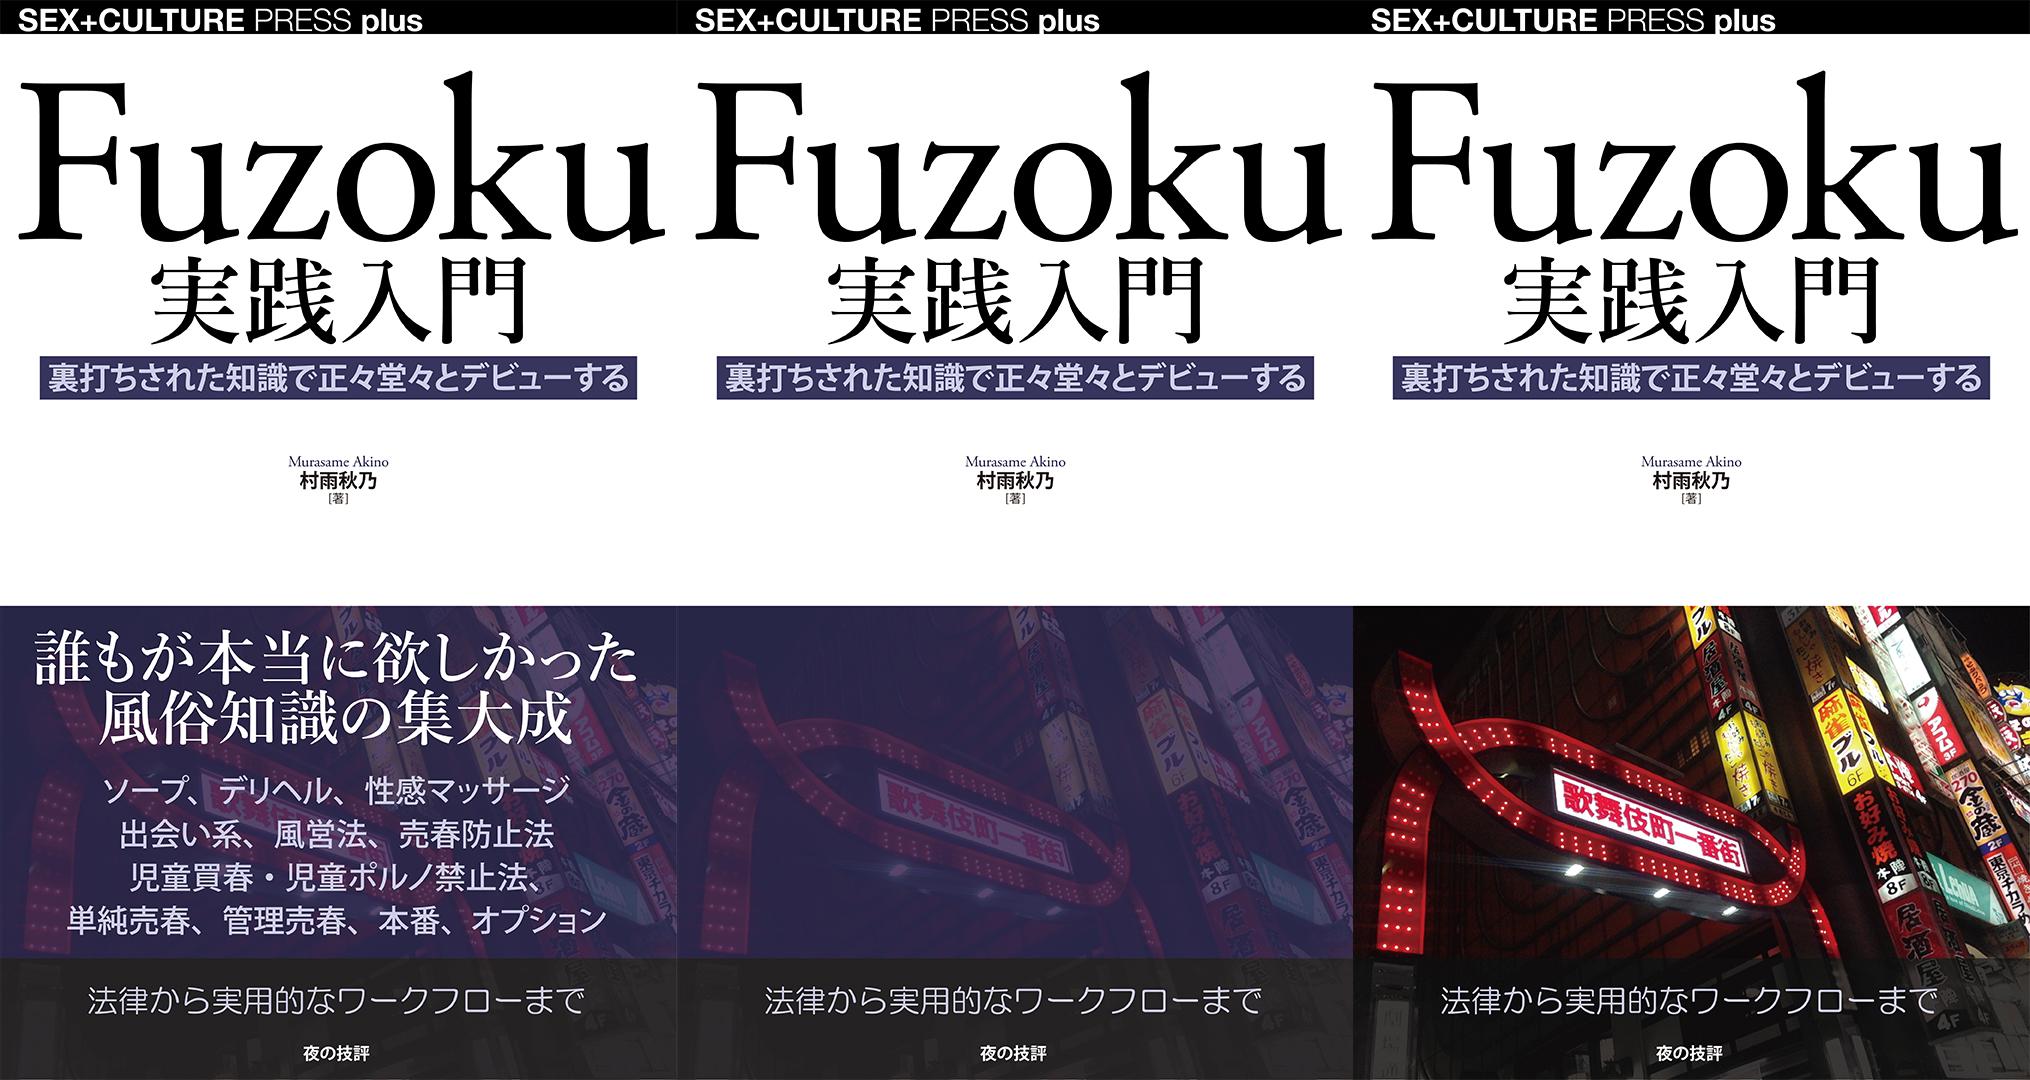 Fuzoku実践入門の表紙比較